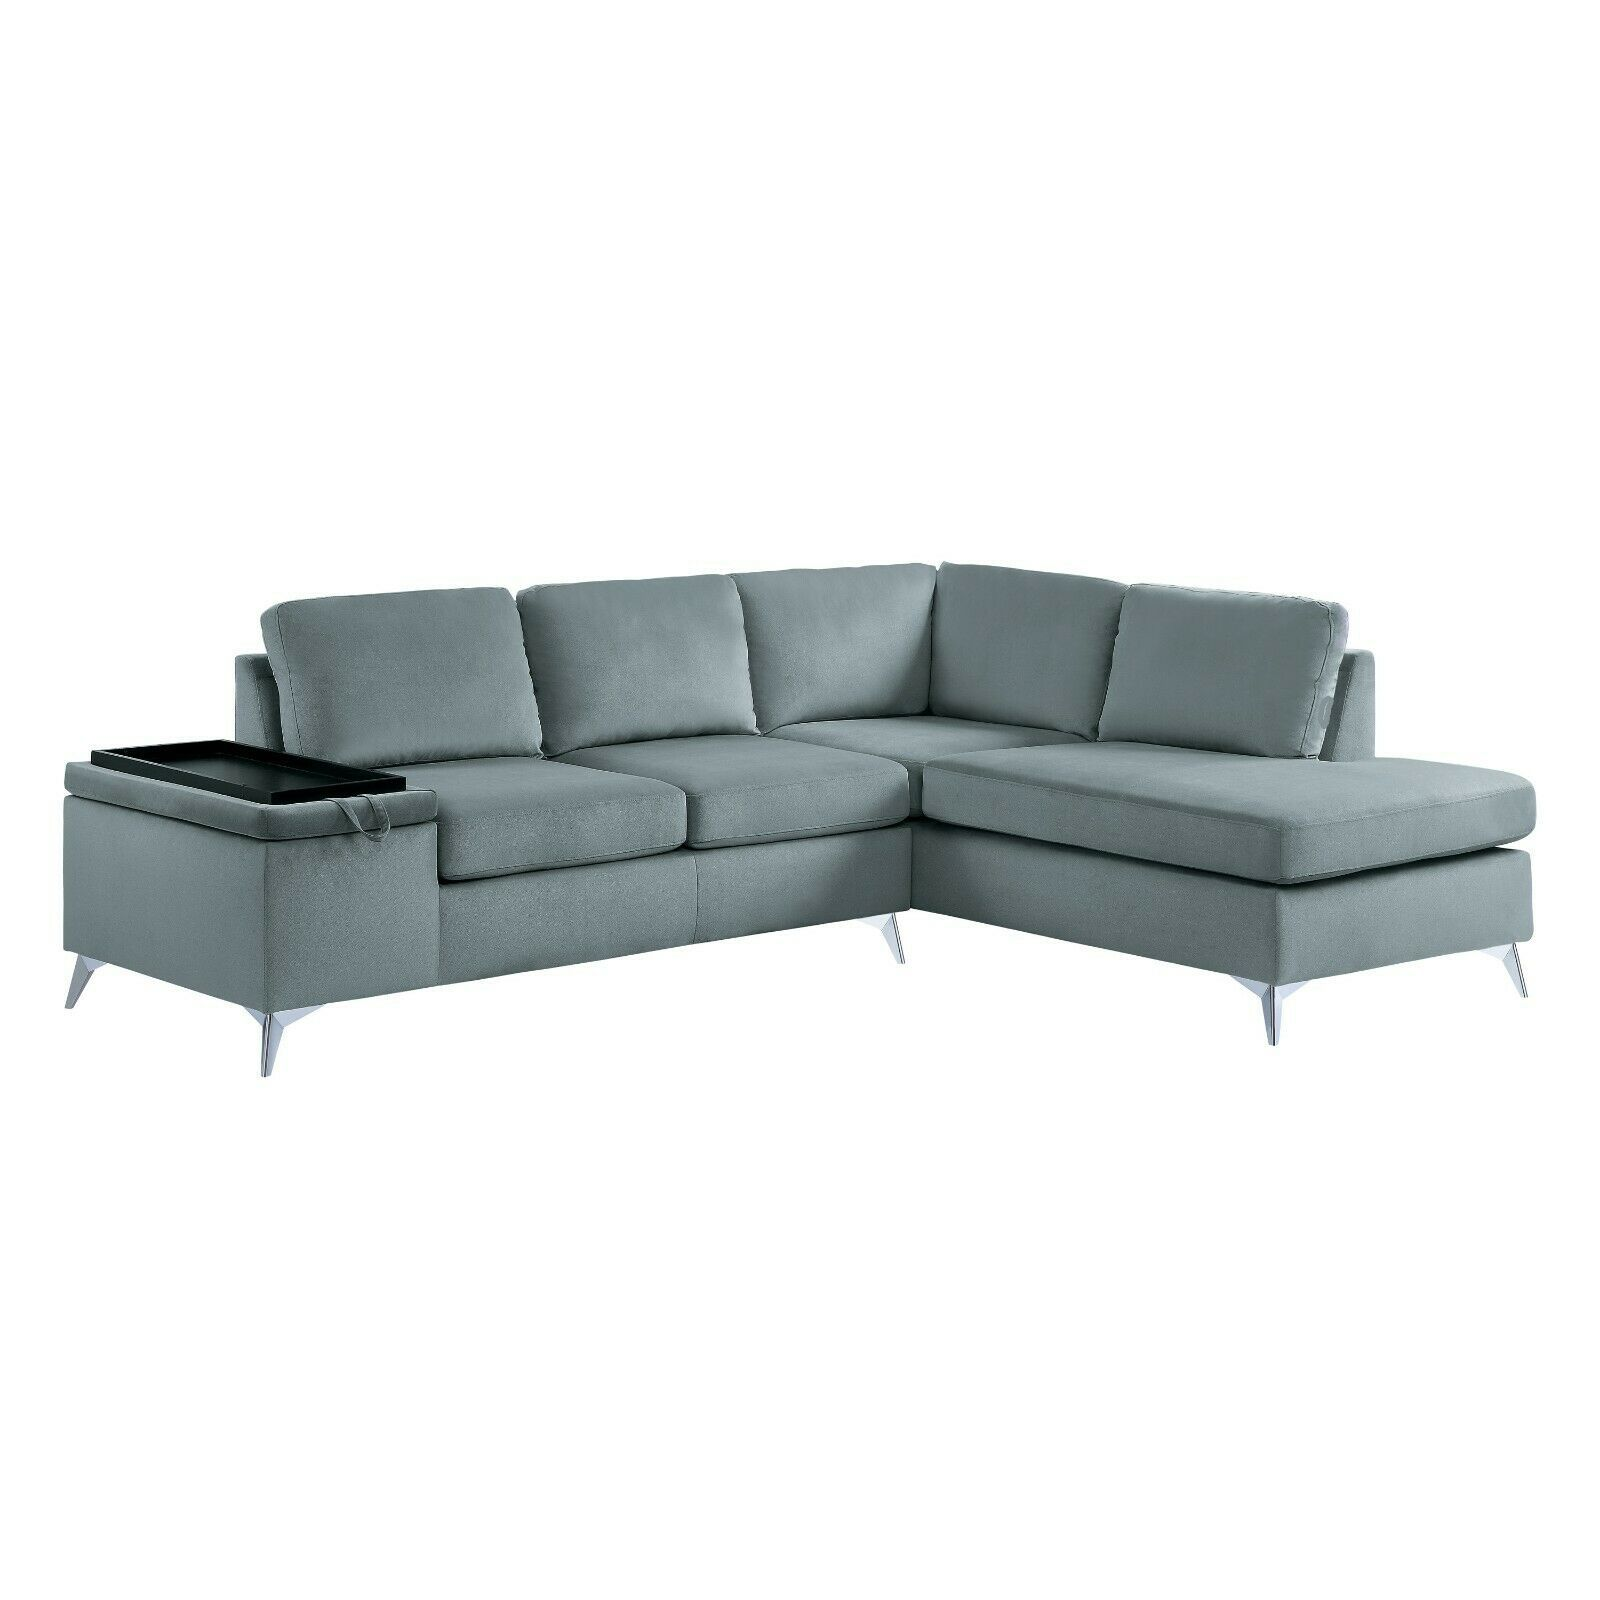 Sleek Grey Velvet Sofa Storage Sectional With Tray Table Living Room Furniture Sofa Living Ideas Of Sofa Living Sofaliving Sofa Sectional Sofa Modular Sofa Sofa